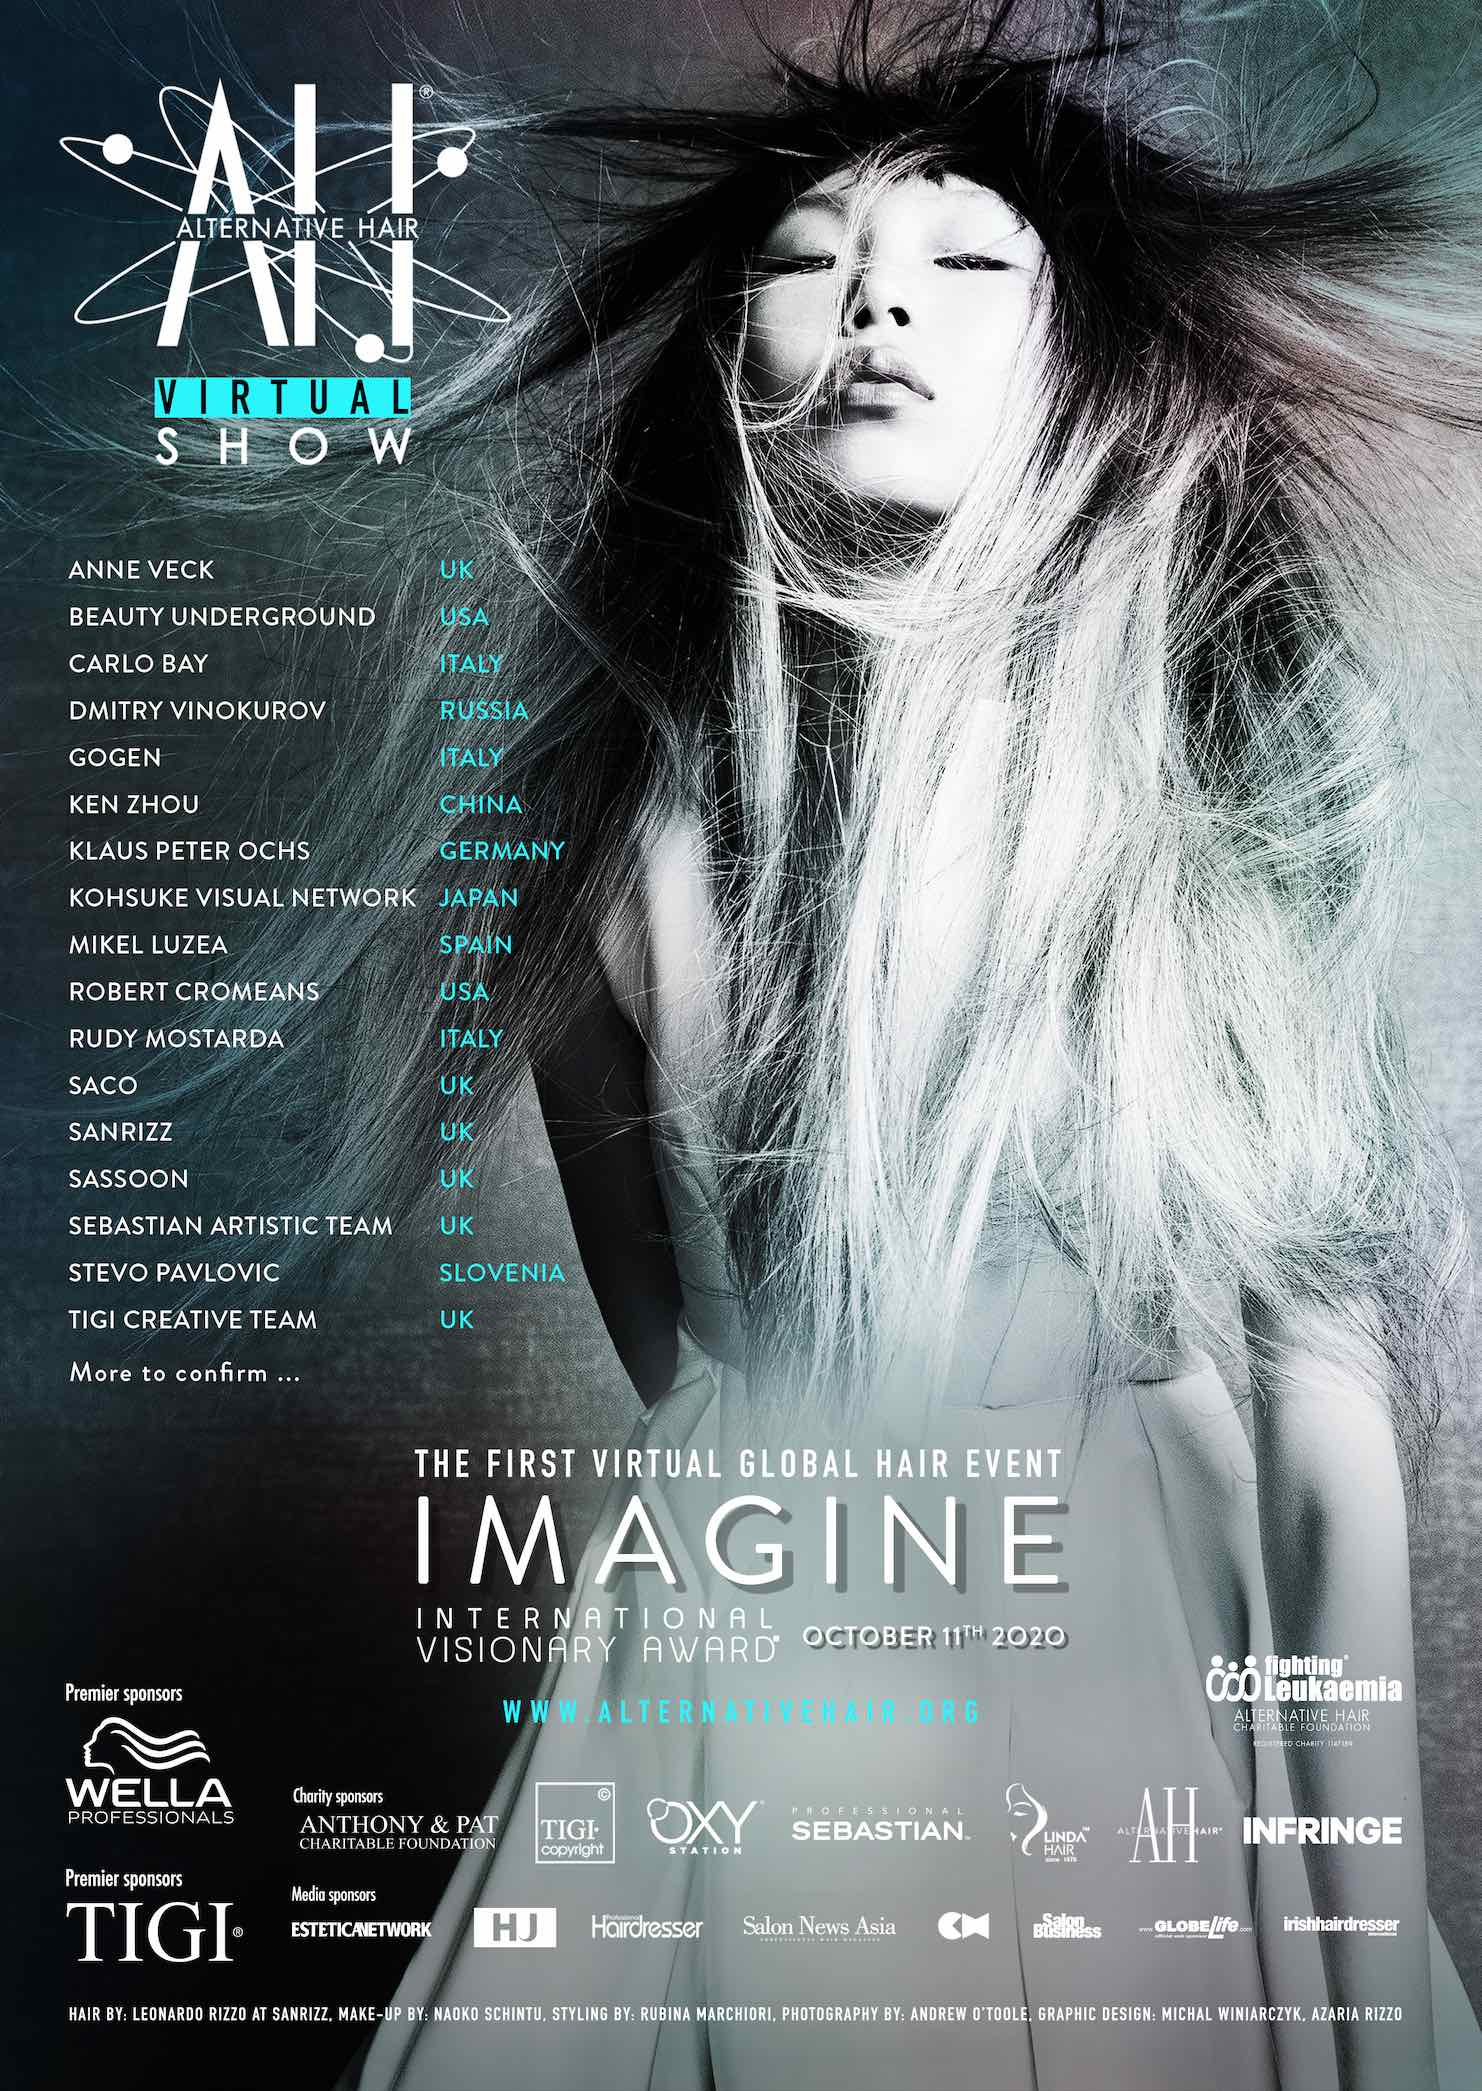 ONDERTUSSEN IN DE UK: Salon International afgelast en Alternative Hair Show goes digital